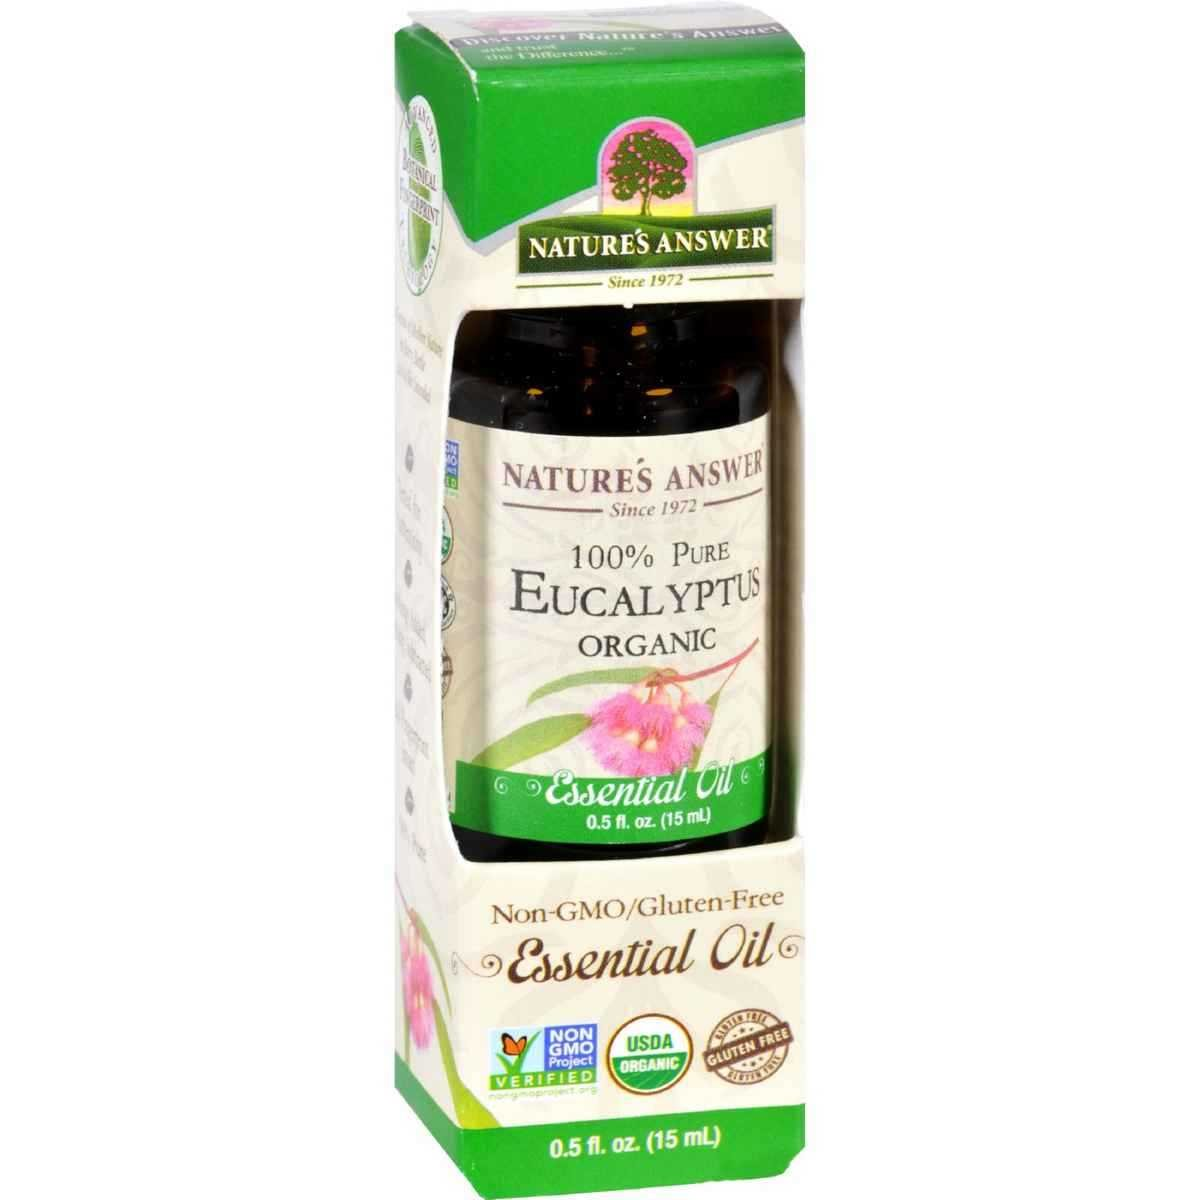 Nature's Answer - Essential Oil Organic Eucalyptus 0.5 oz UNFI - Select Nutrition